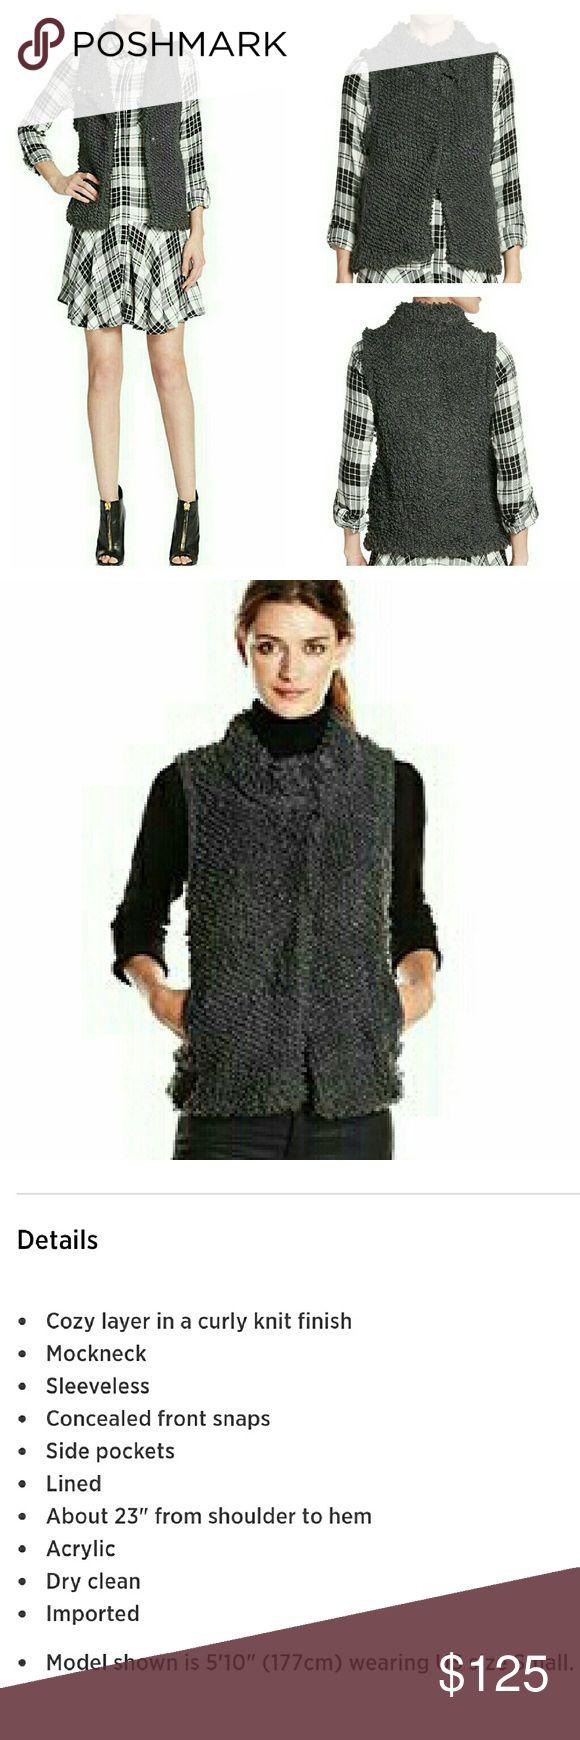 Sam Edleman Knit Gray Vest Sam Edleman Knit Gray Vest. NWT.   No Trade or PP Bundle discounts Offers Considered Sam Edelman Jackets & Coats Vests